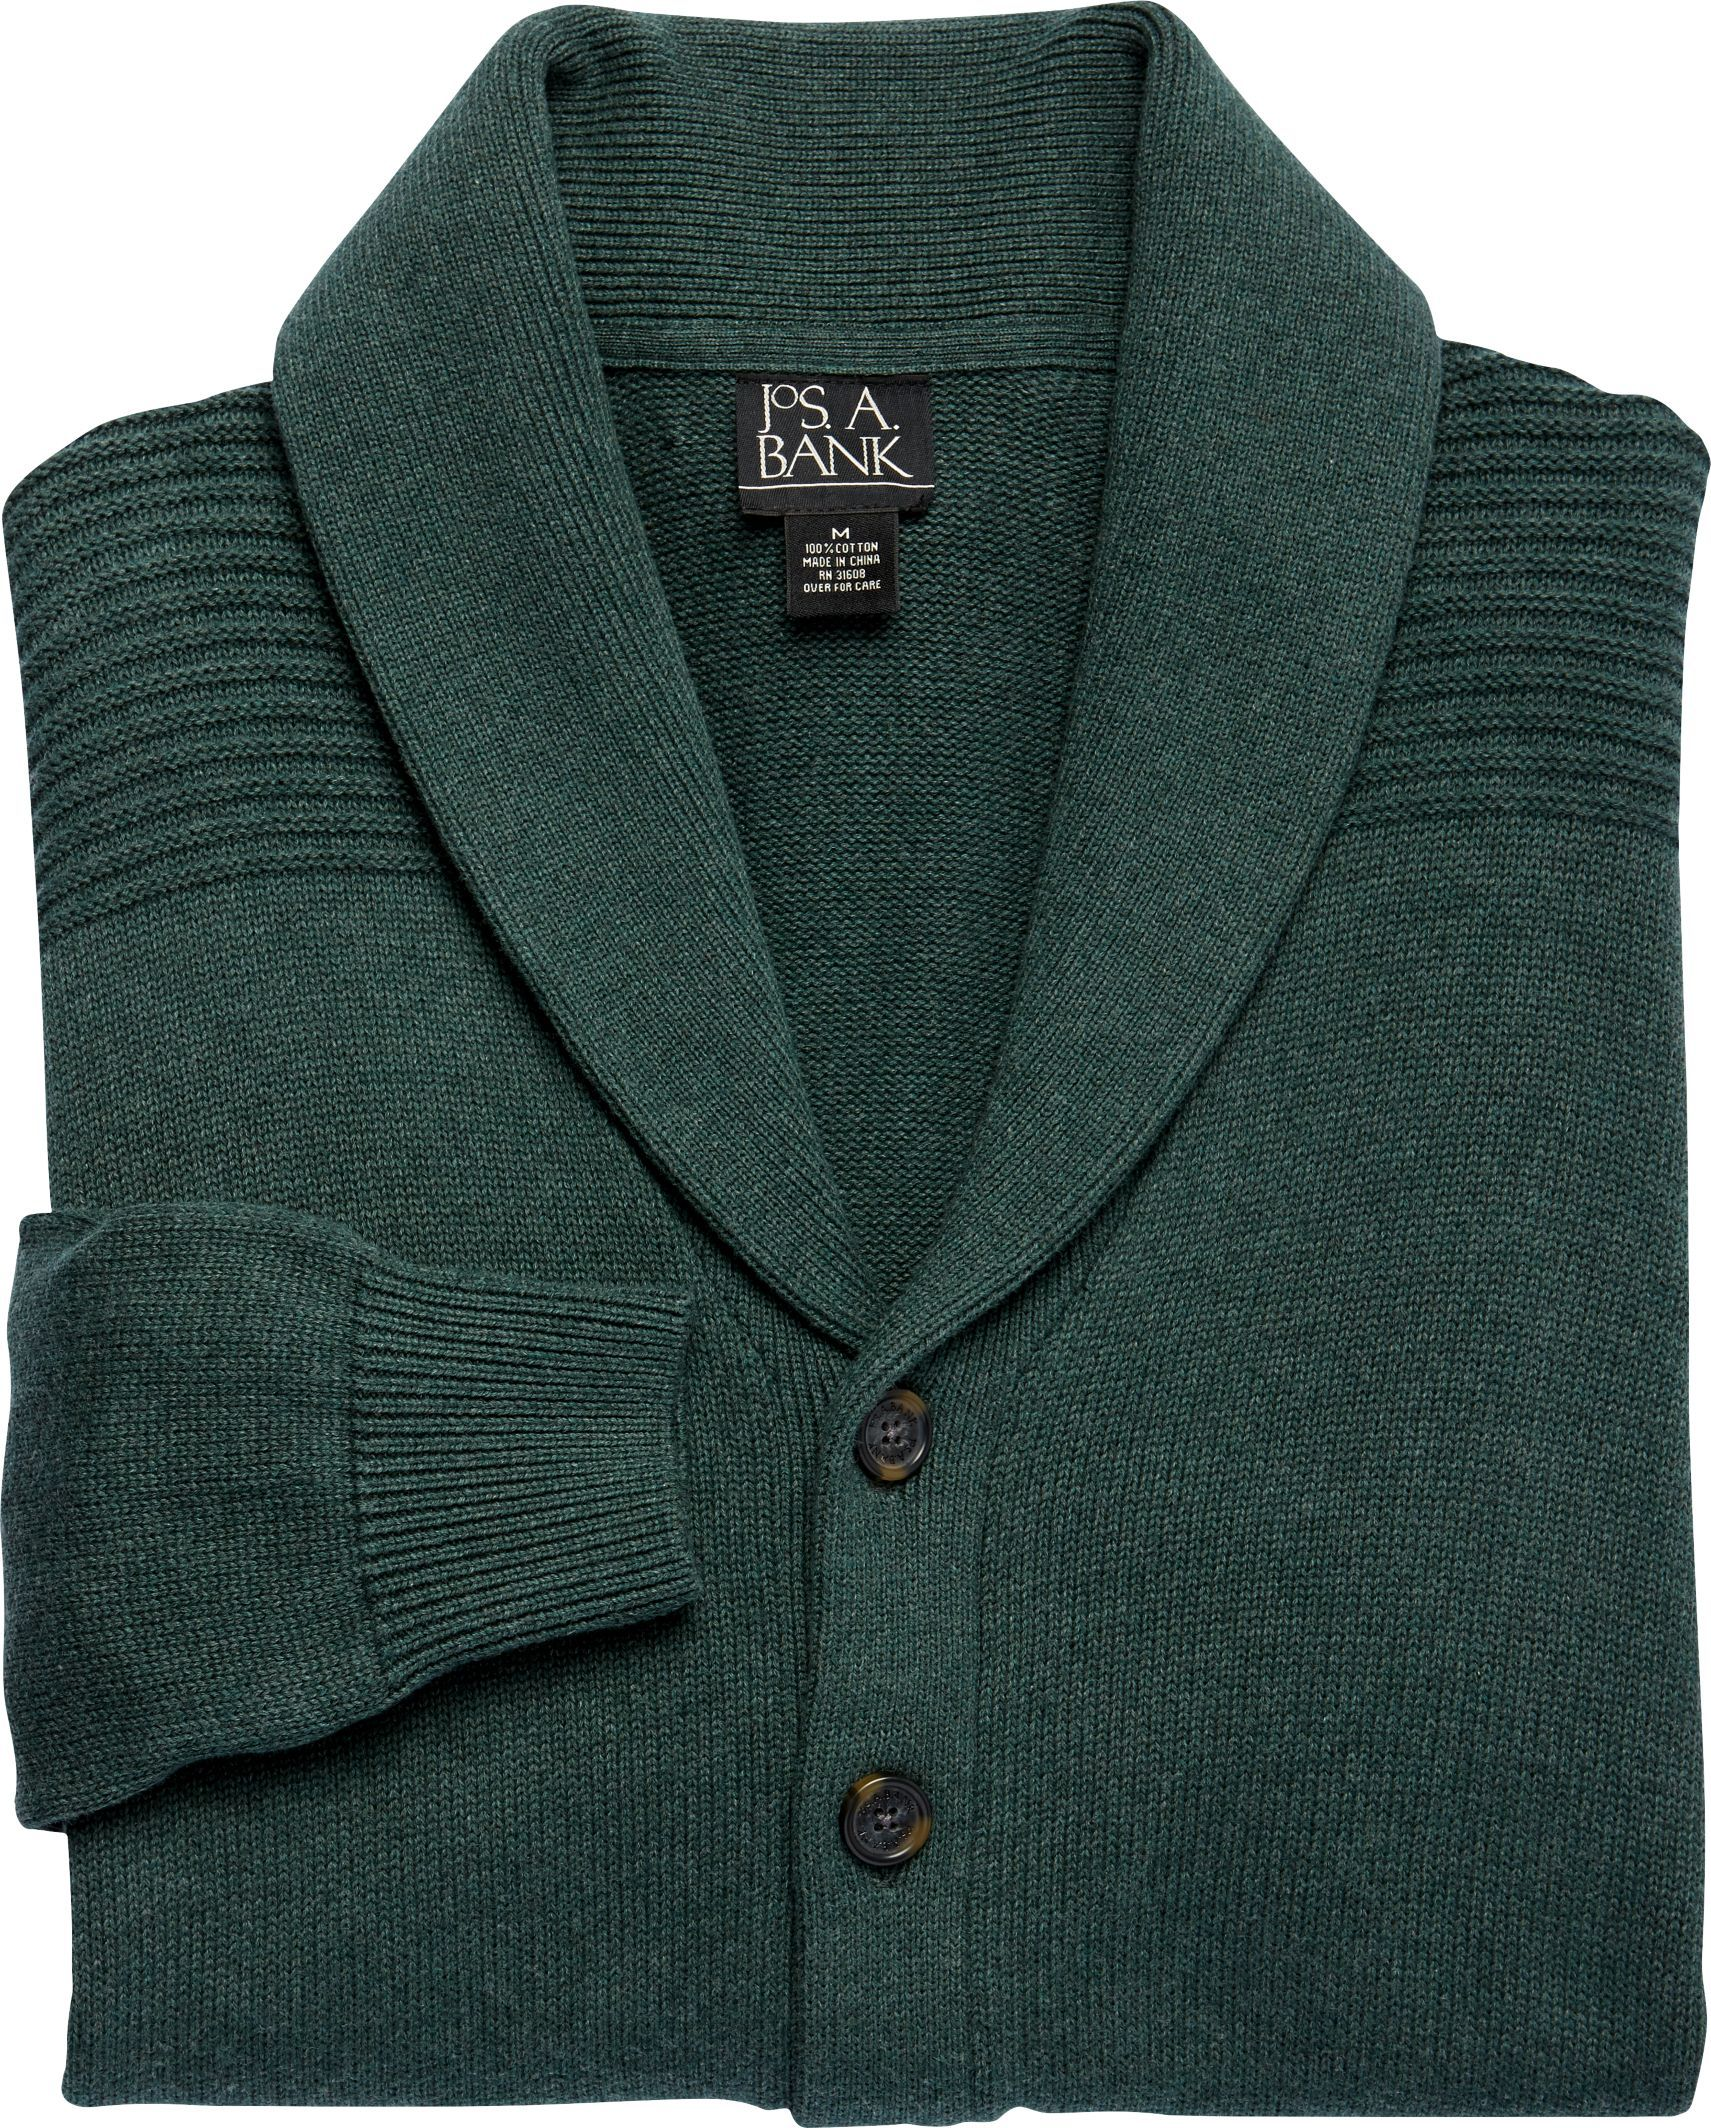 325 Jos A Bank Traveler Cashmere V Neck Sweater Mens Fashion Sweaters Preppy Mens Fashion Vneck Sweater